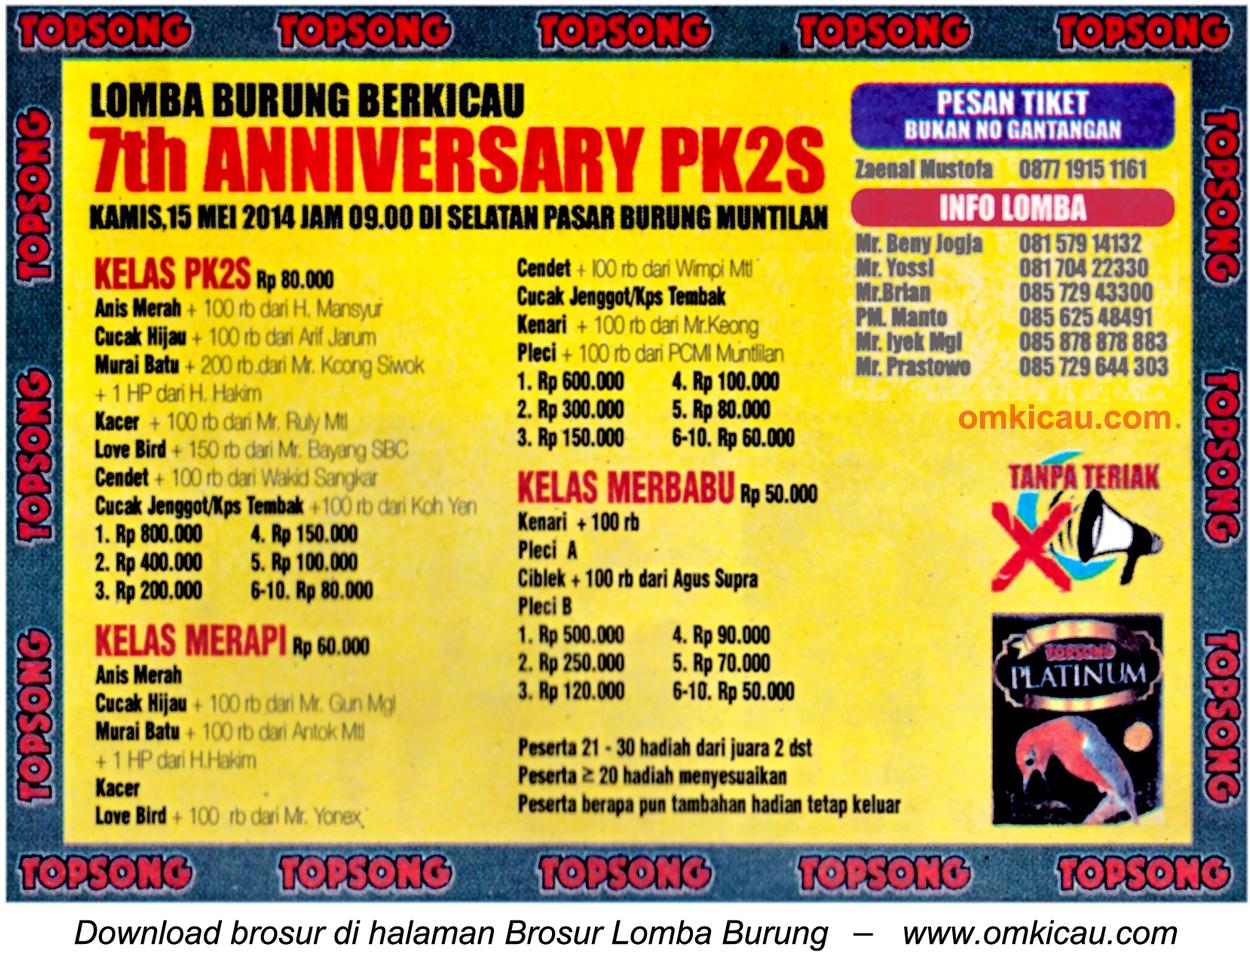 Brosur Lomba Burung Berkicau 7th Anniversary PK2S, Muntilan, 15 Mei 2014